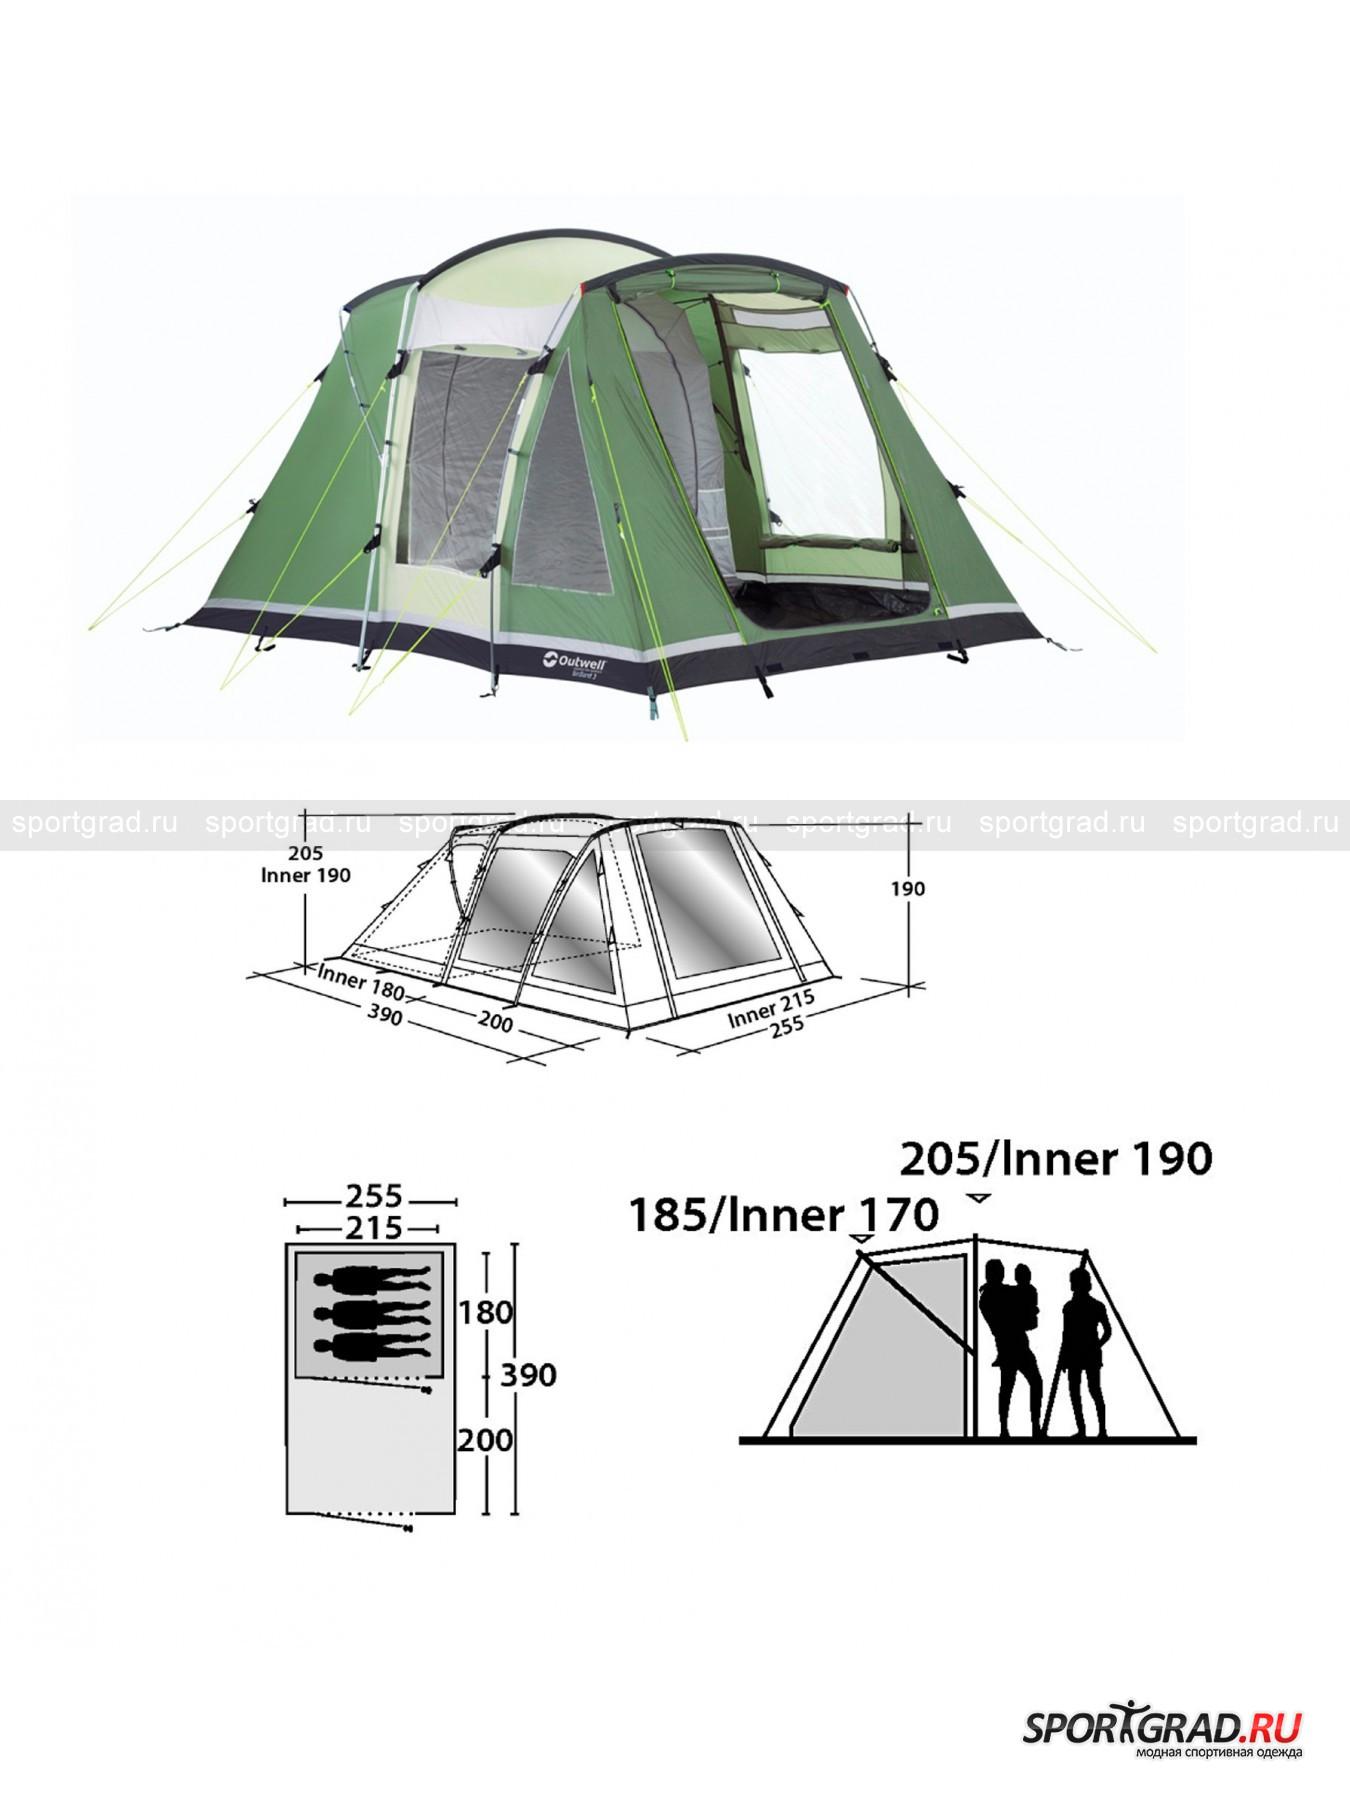 Палатка Birdland 3 OUTWELL от Спортград